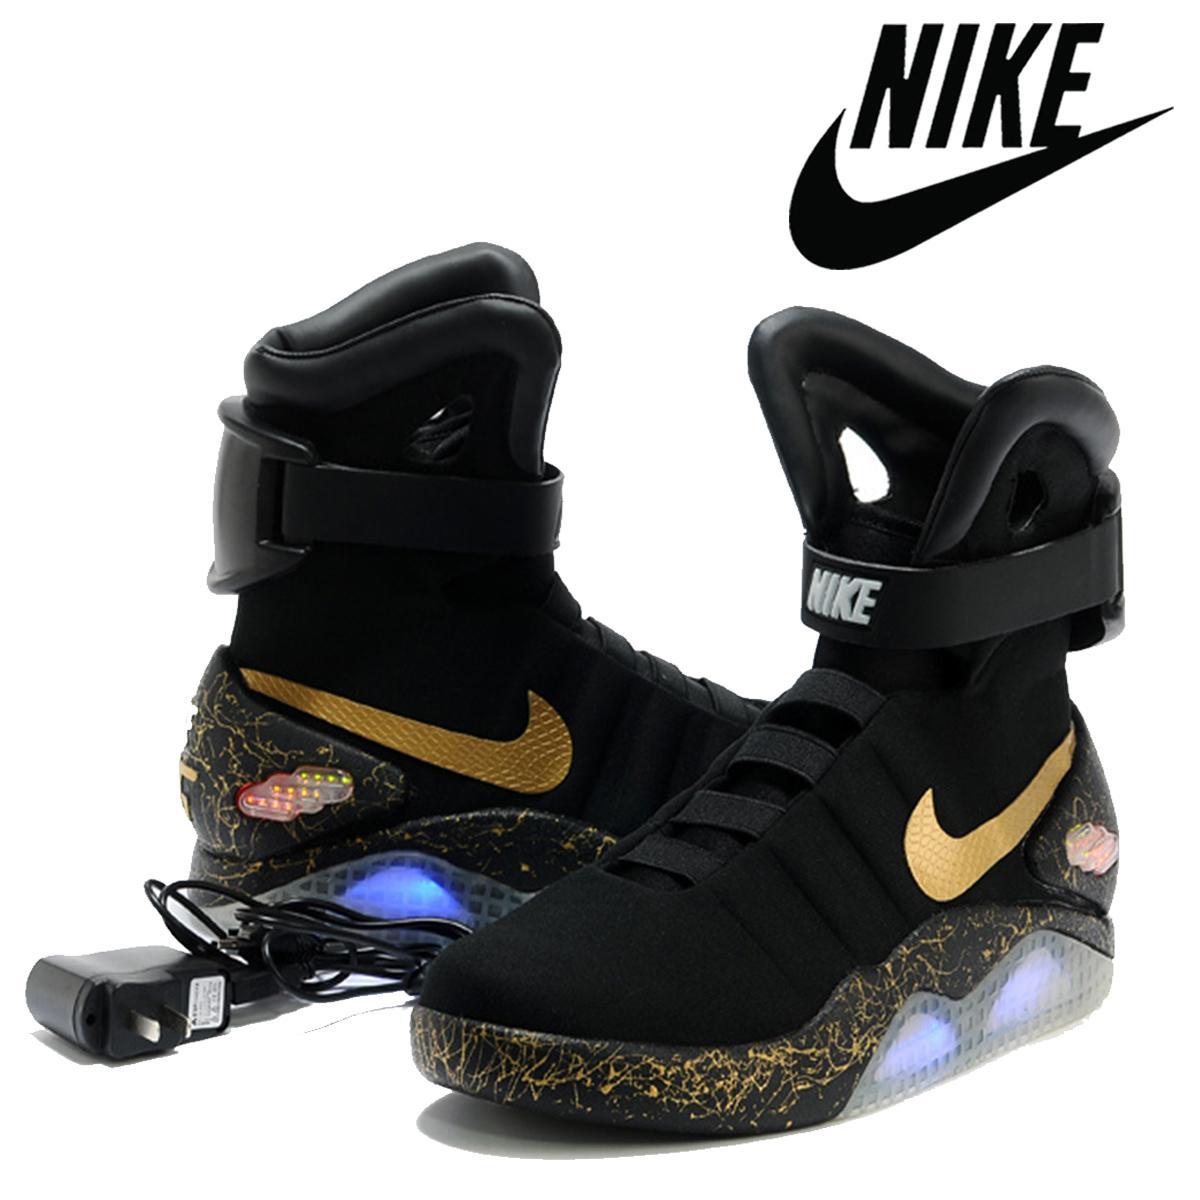 official photos c6975 70c63 Acheter 2016 Nike Air MAG Chaussures LED Hommes Nike Mag Chaussures De  Basket Hommes Mode Chaussures De Course De Taille Luxury Gris 8 12  Factorystore01 ...